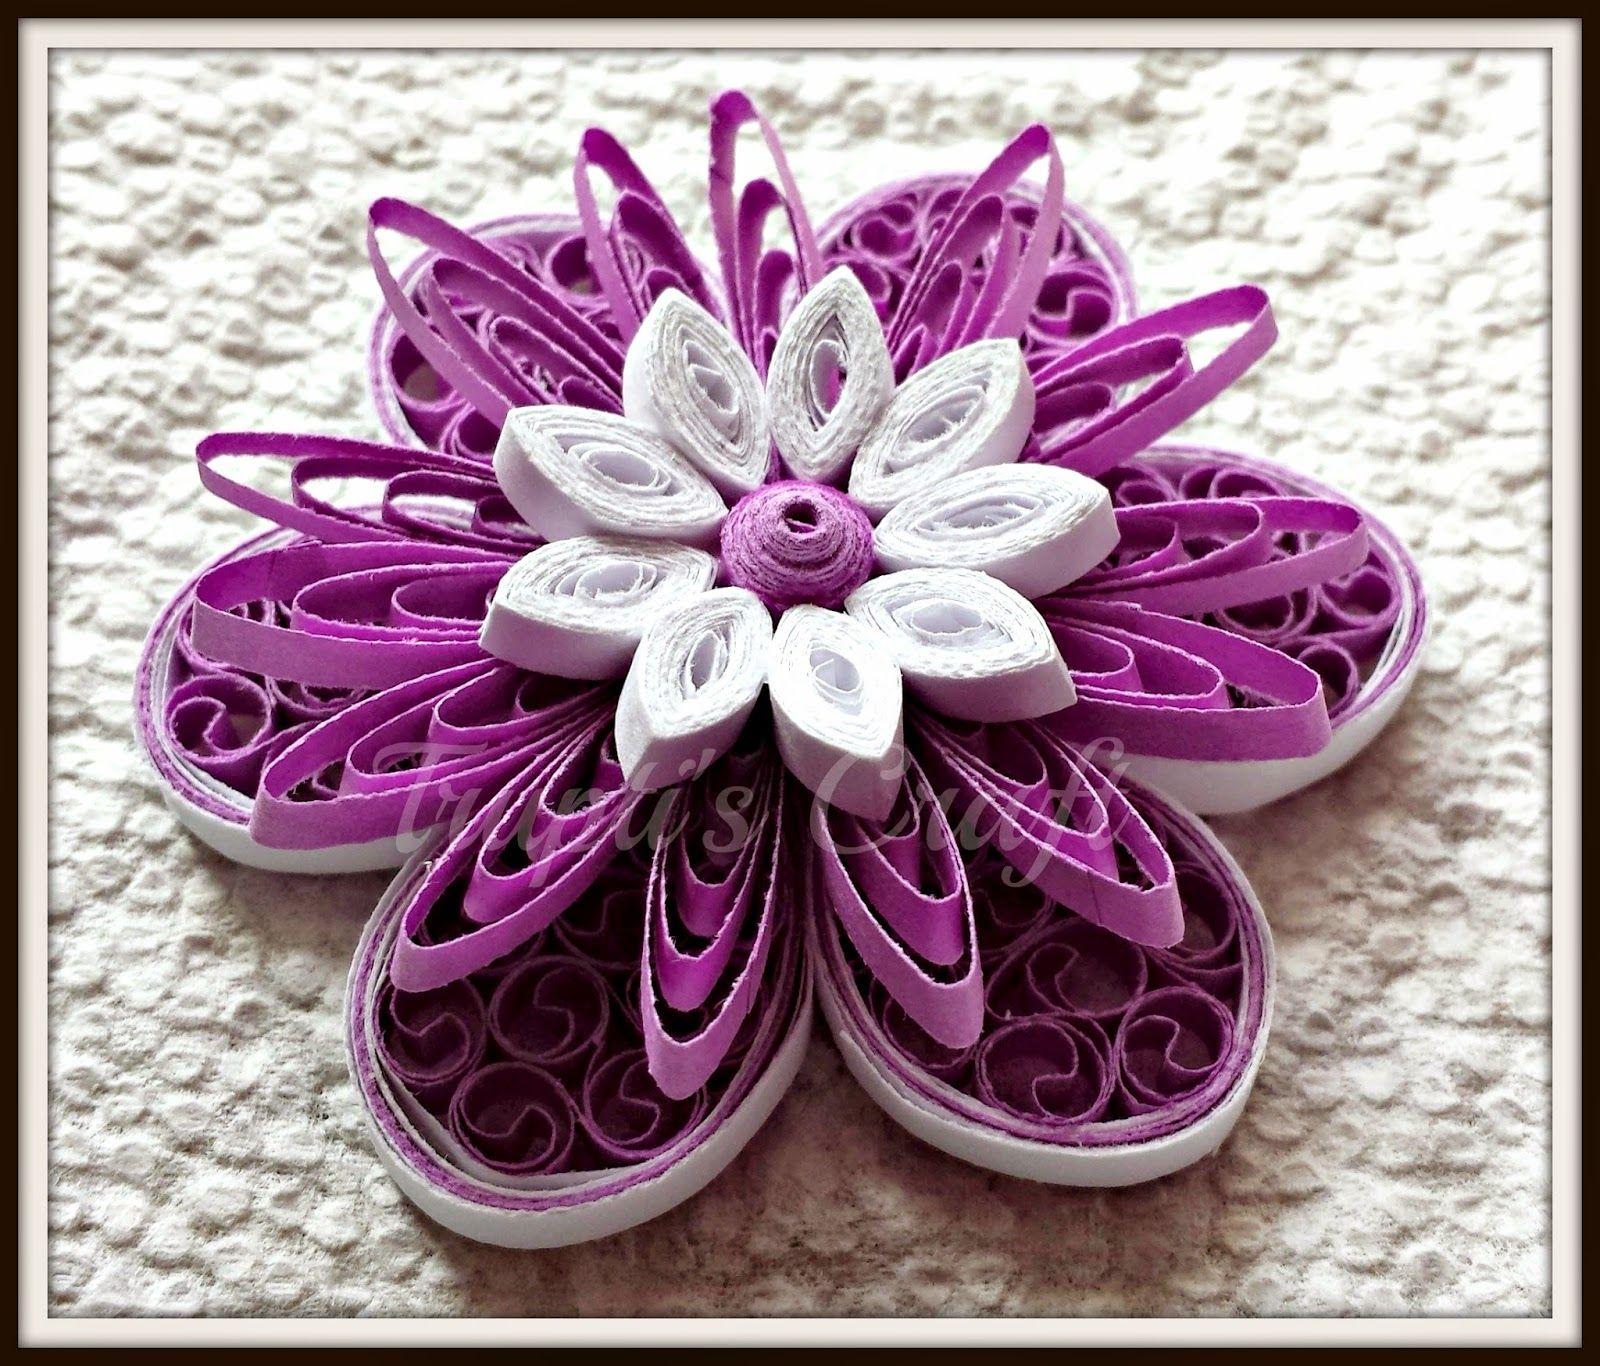 Paperquillingflower1g 16001366 handmade pinterest paperquillingflower1g 16001366 mightylinksfo